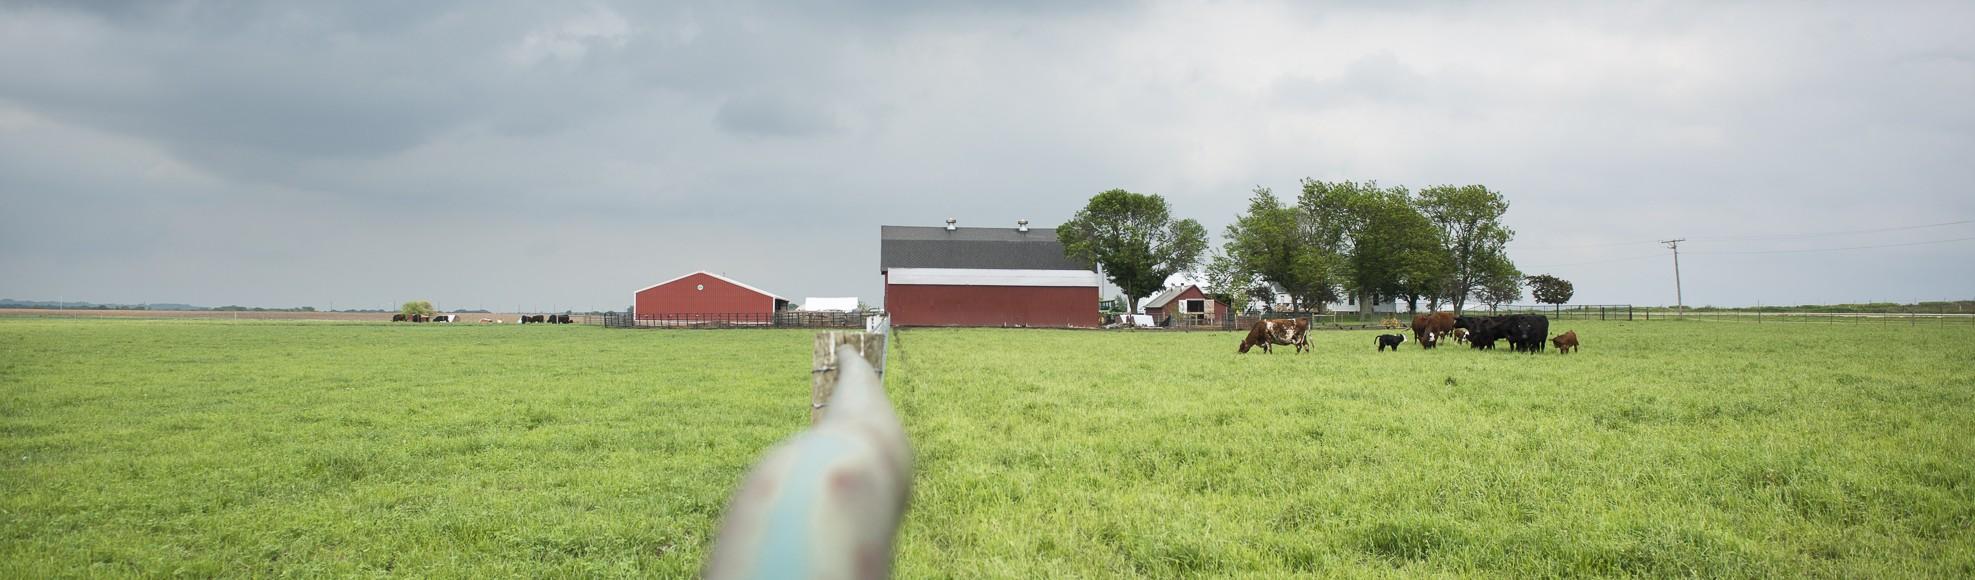 Hasselmann Farm